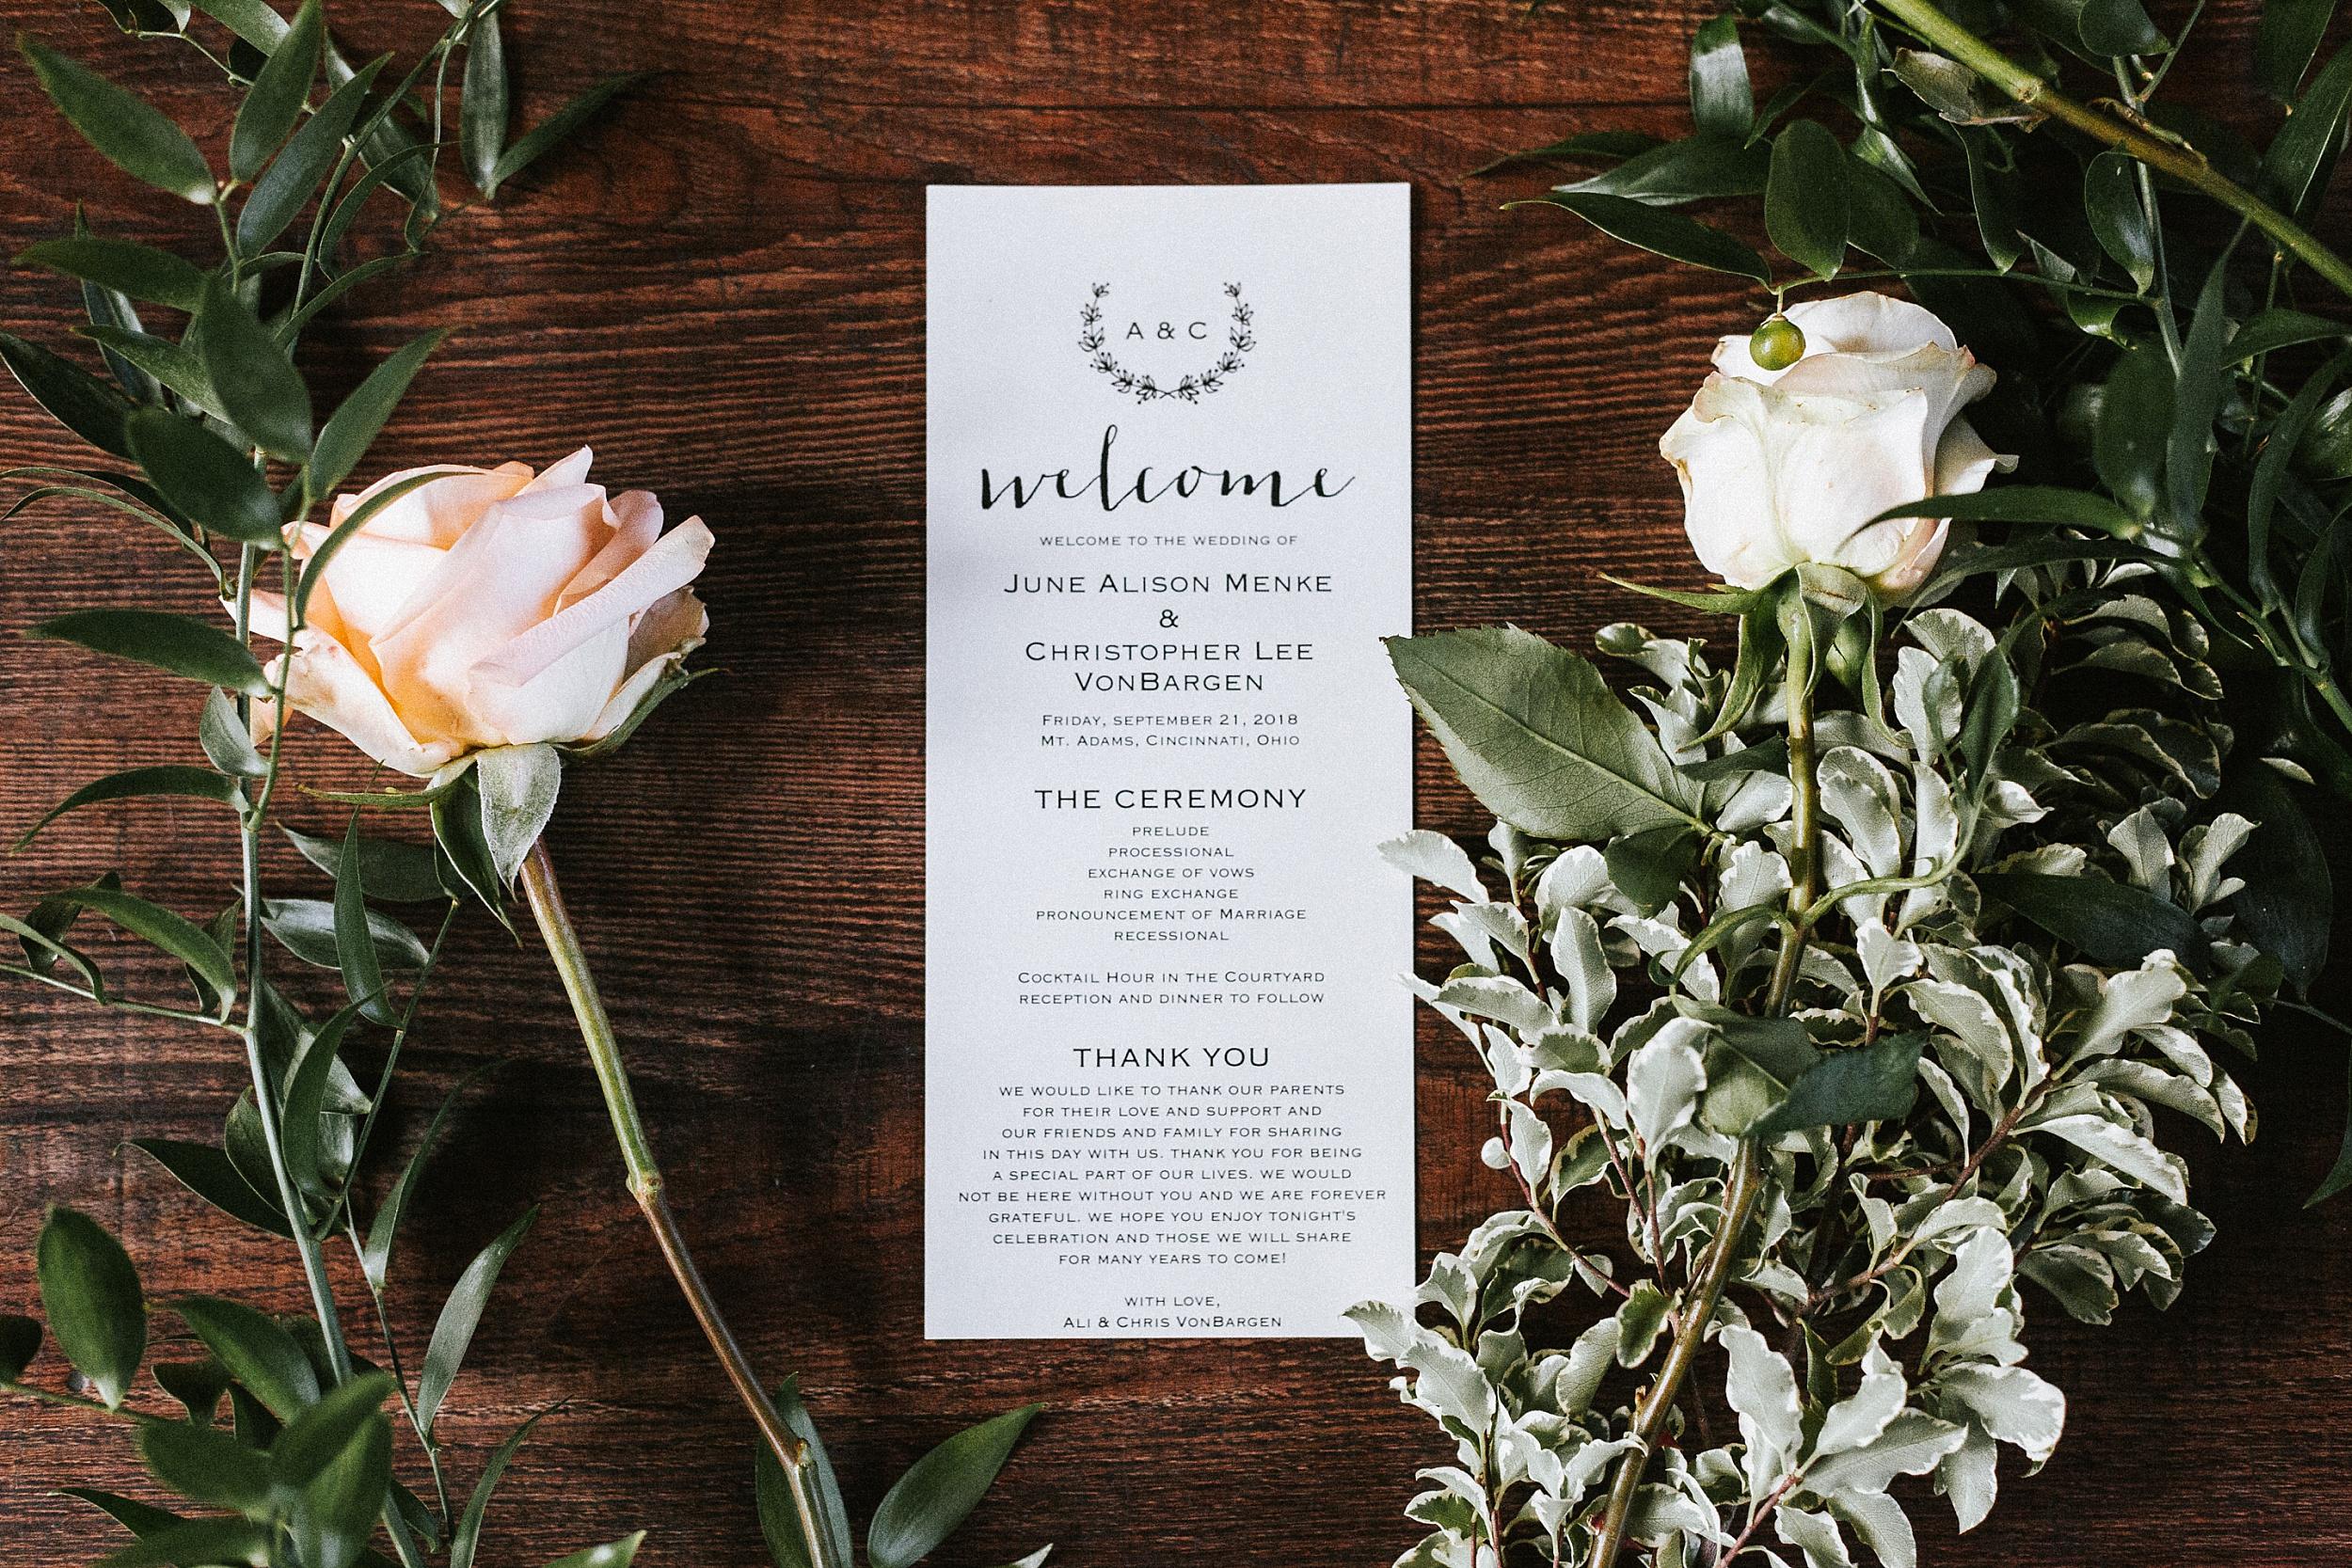 Brooke Townsend Photography - Cincinnati Wedding Photographer (17 of 170).jpg